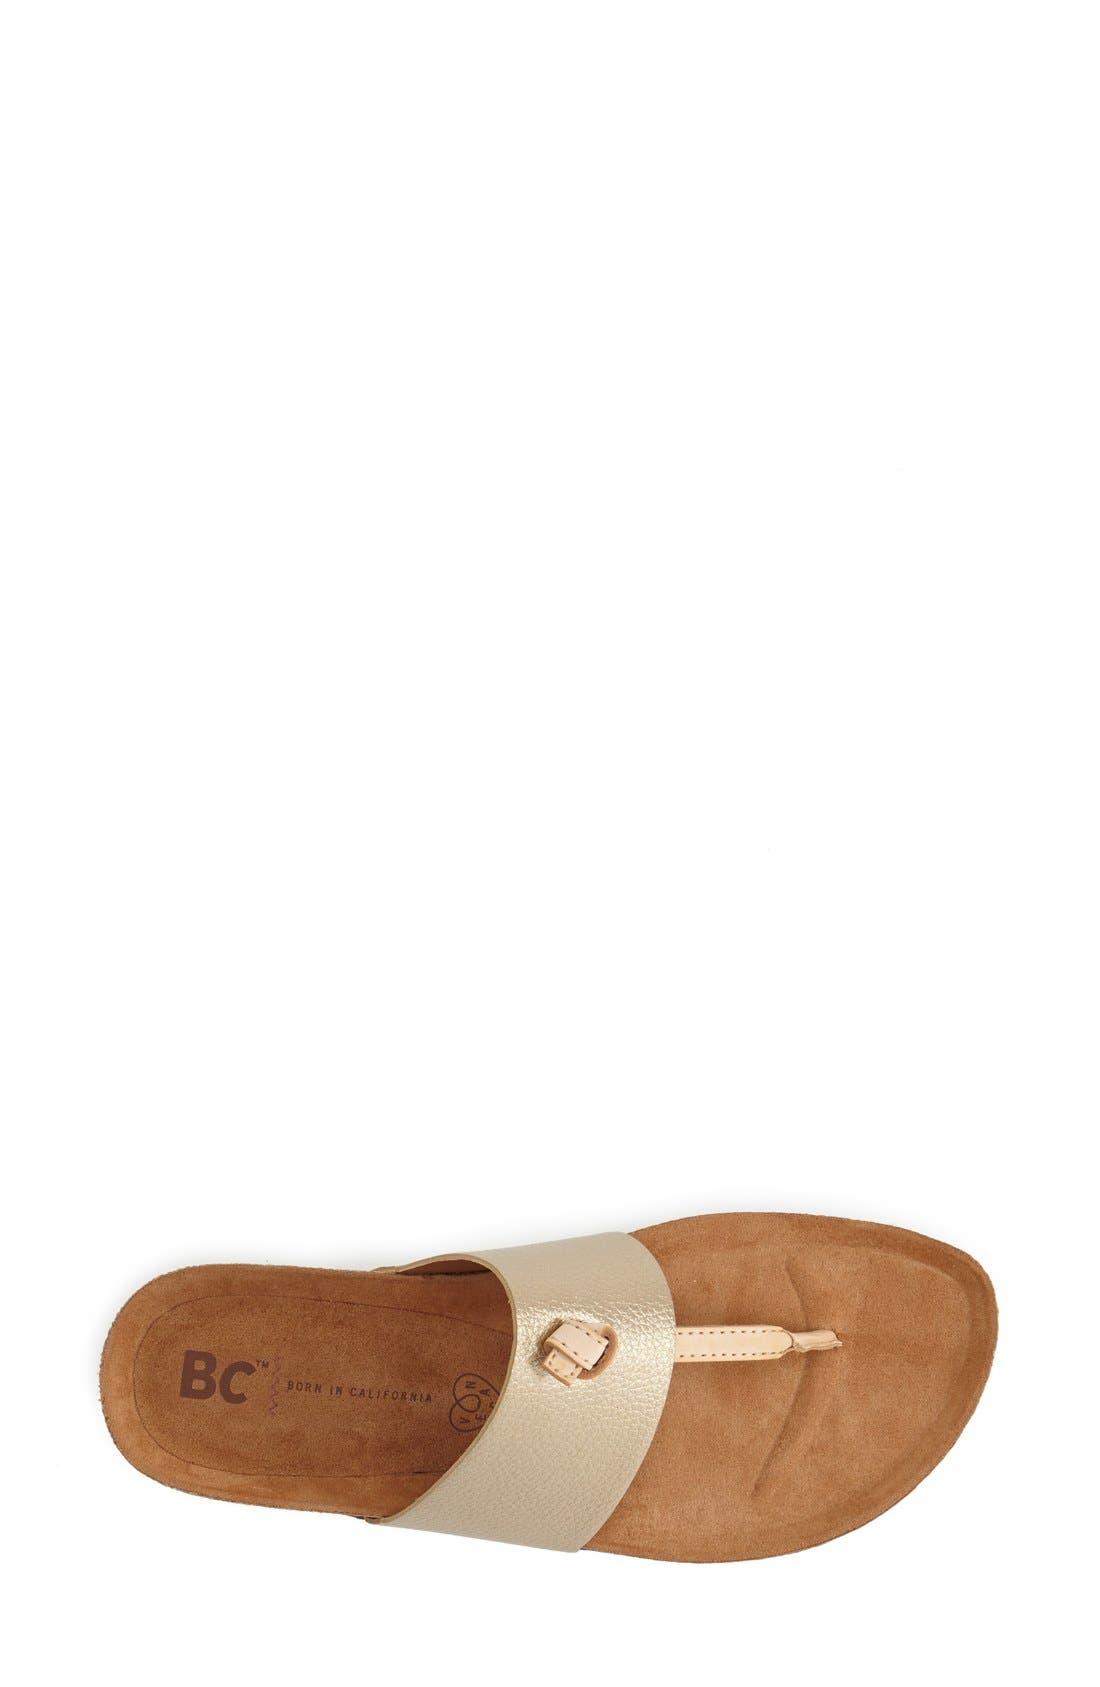 Alternate Image 3  - BC Footwear 'Lynx' Faux Leather Thong Sandal (Women)